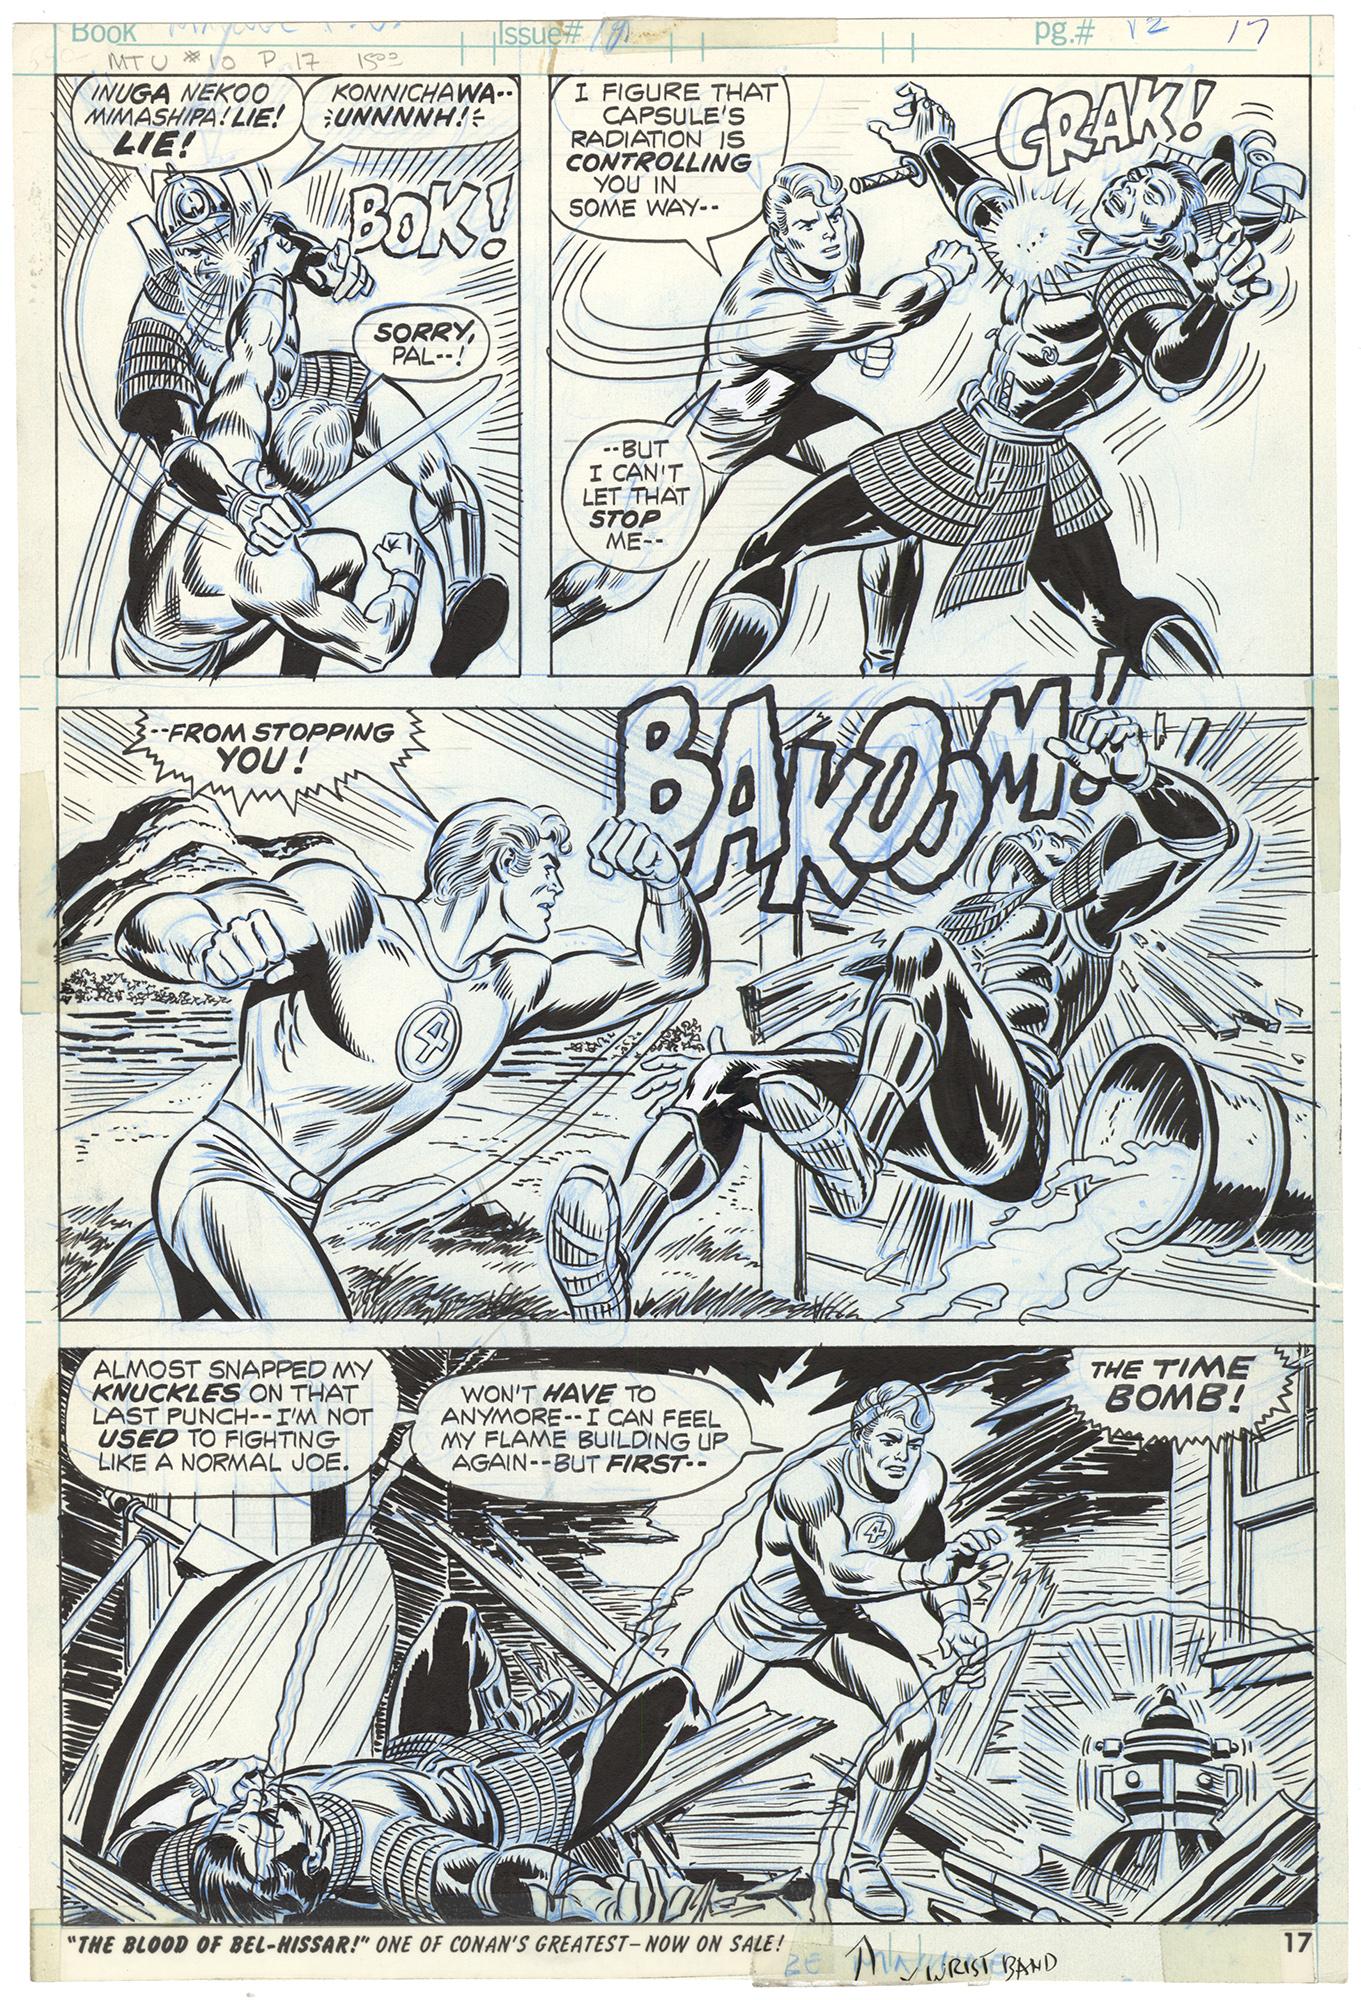 Marvel Team-Up #10 p17